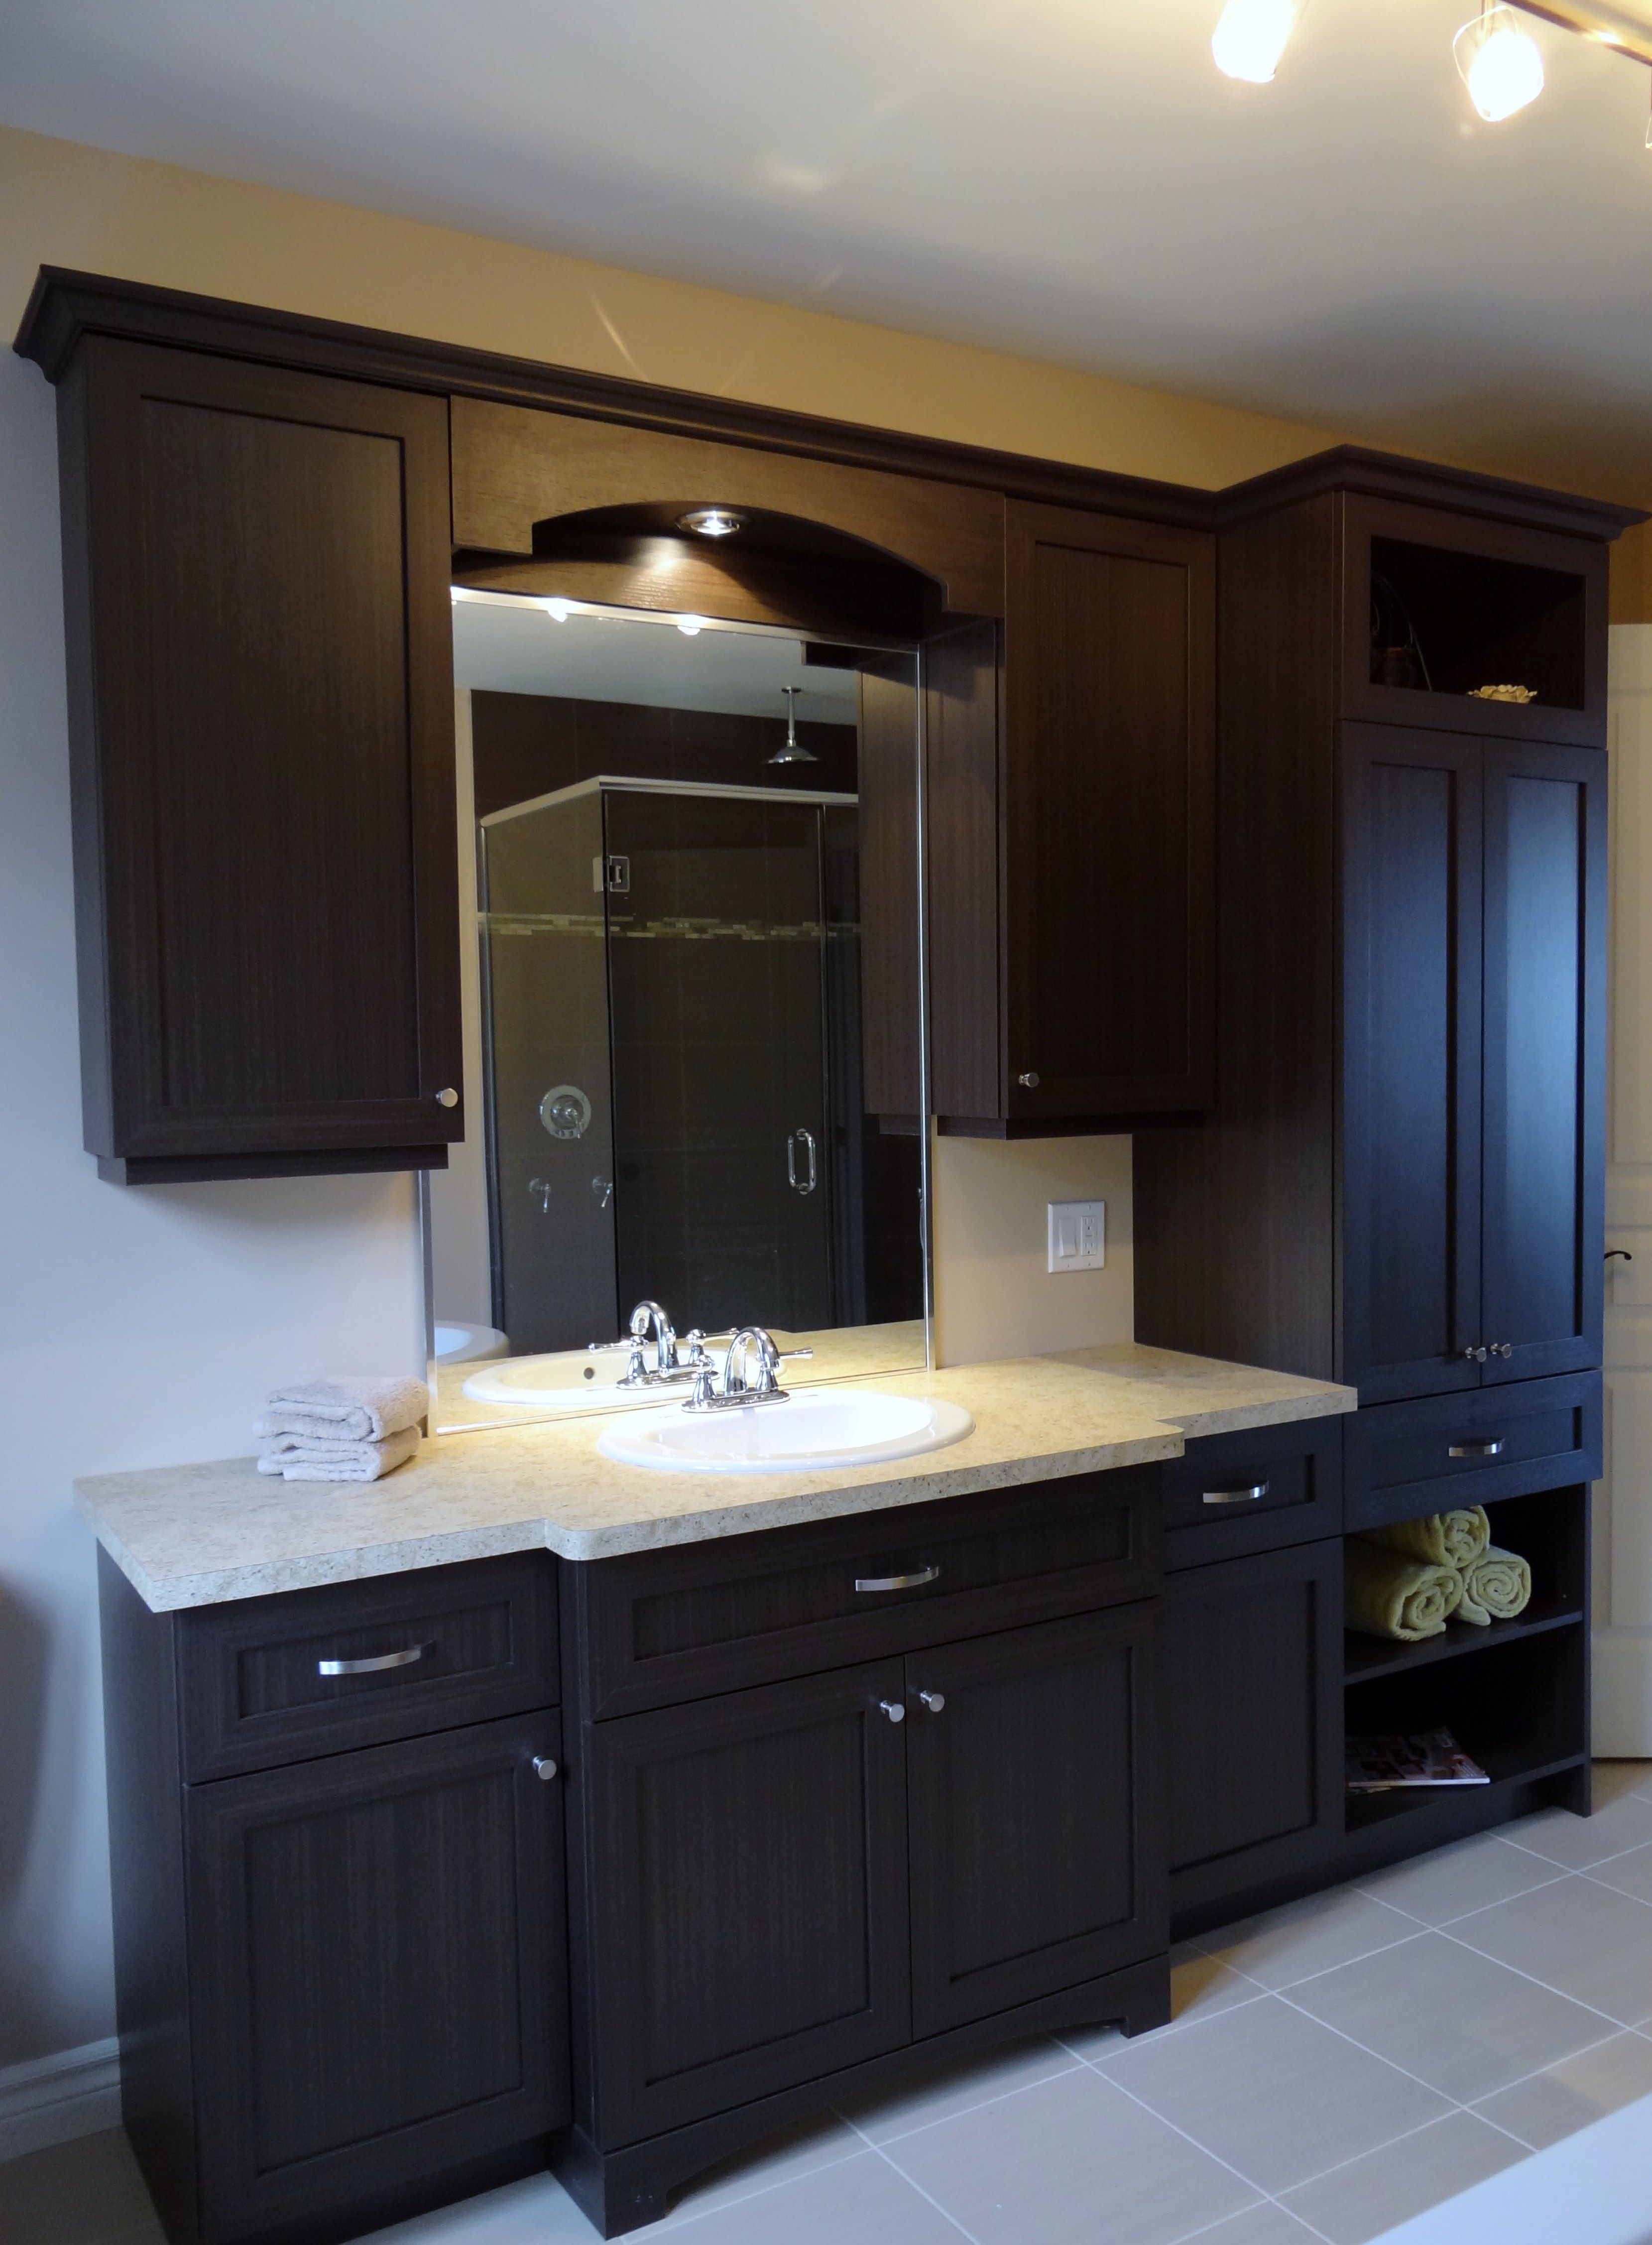 vanité salle de bain liquidation - 28 images - vanit 233 en pin ...